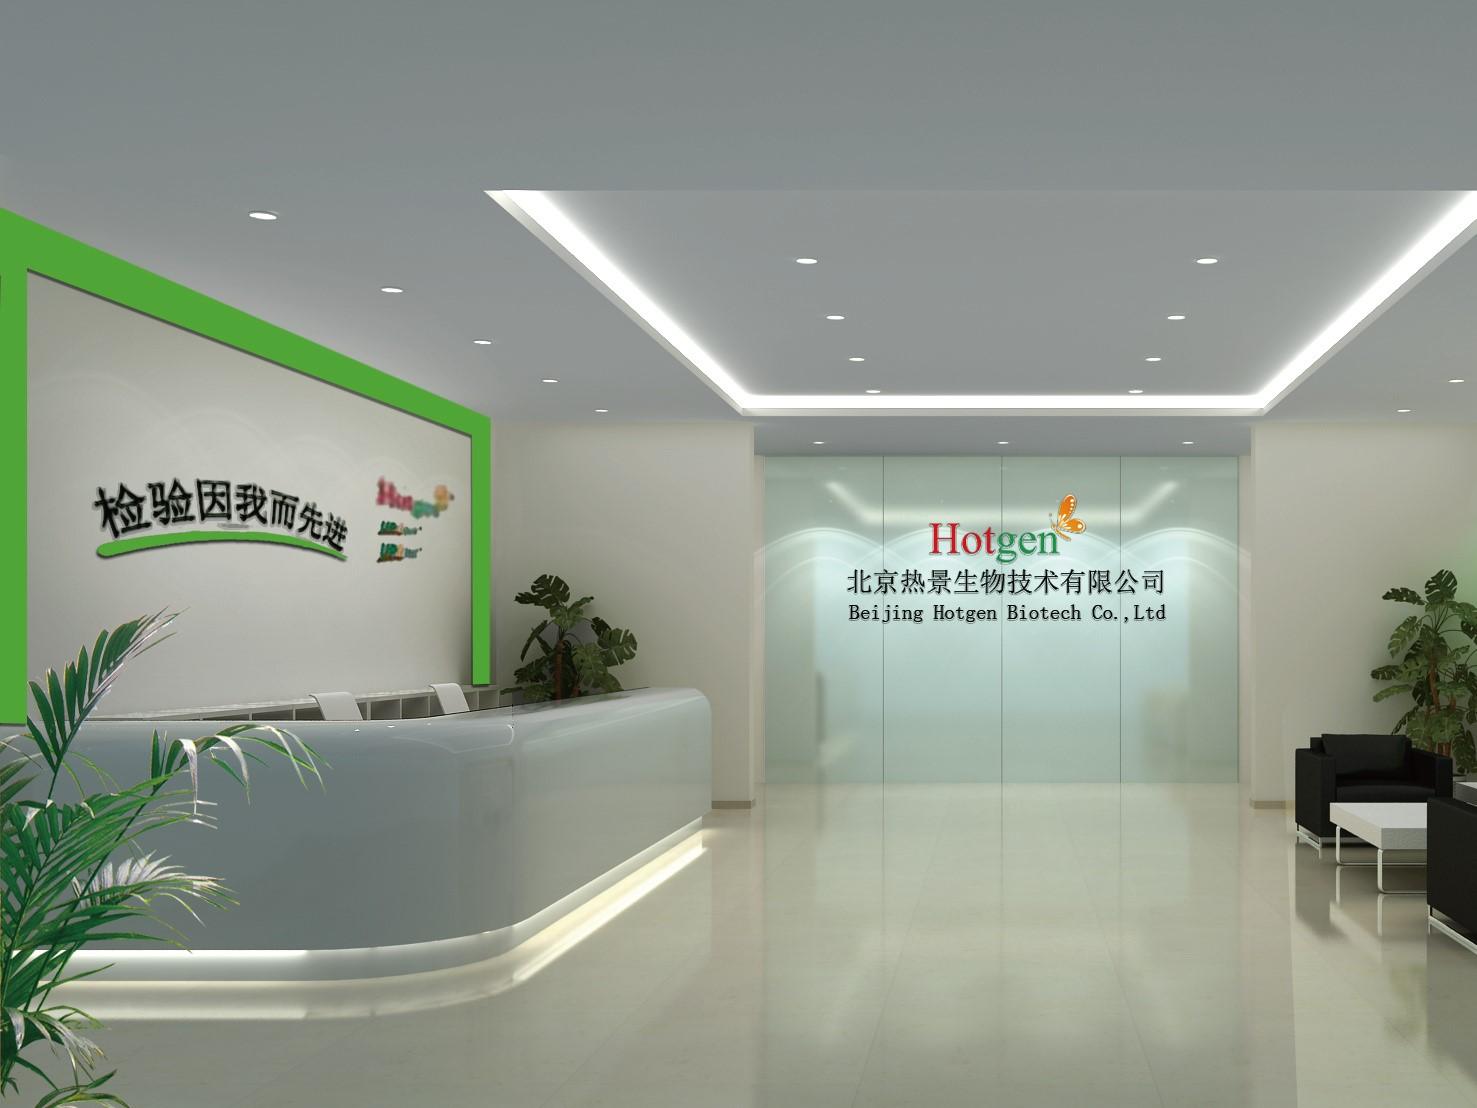 Hotgen Biotech Bursts onto Shanghai Sci-Tech Board, Its Shares Up 140%